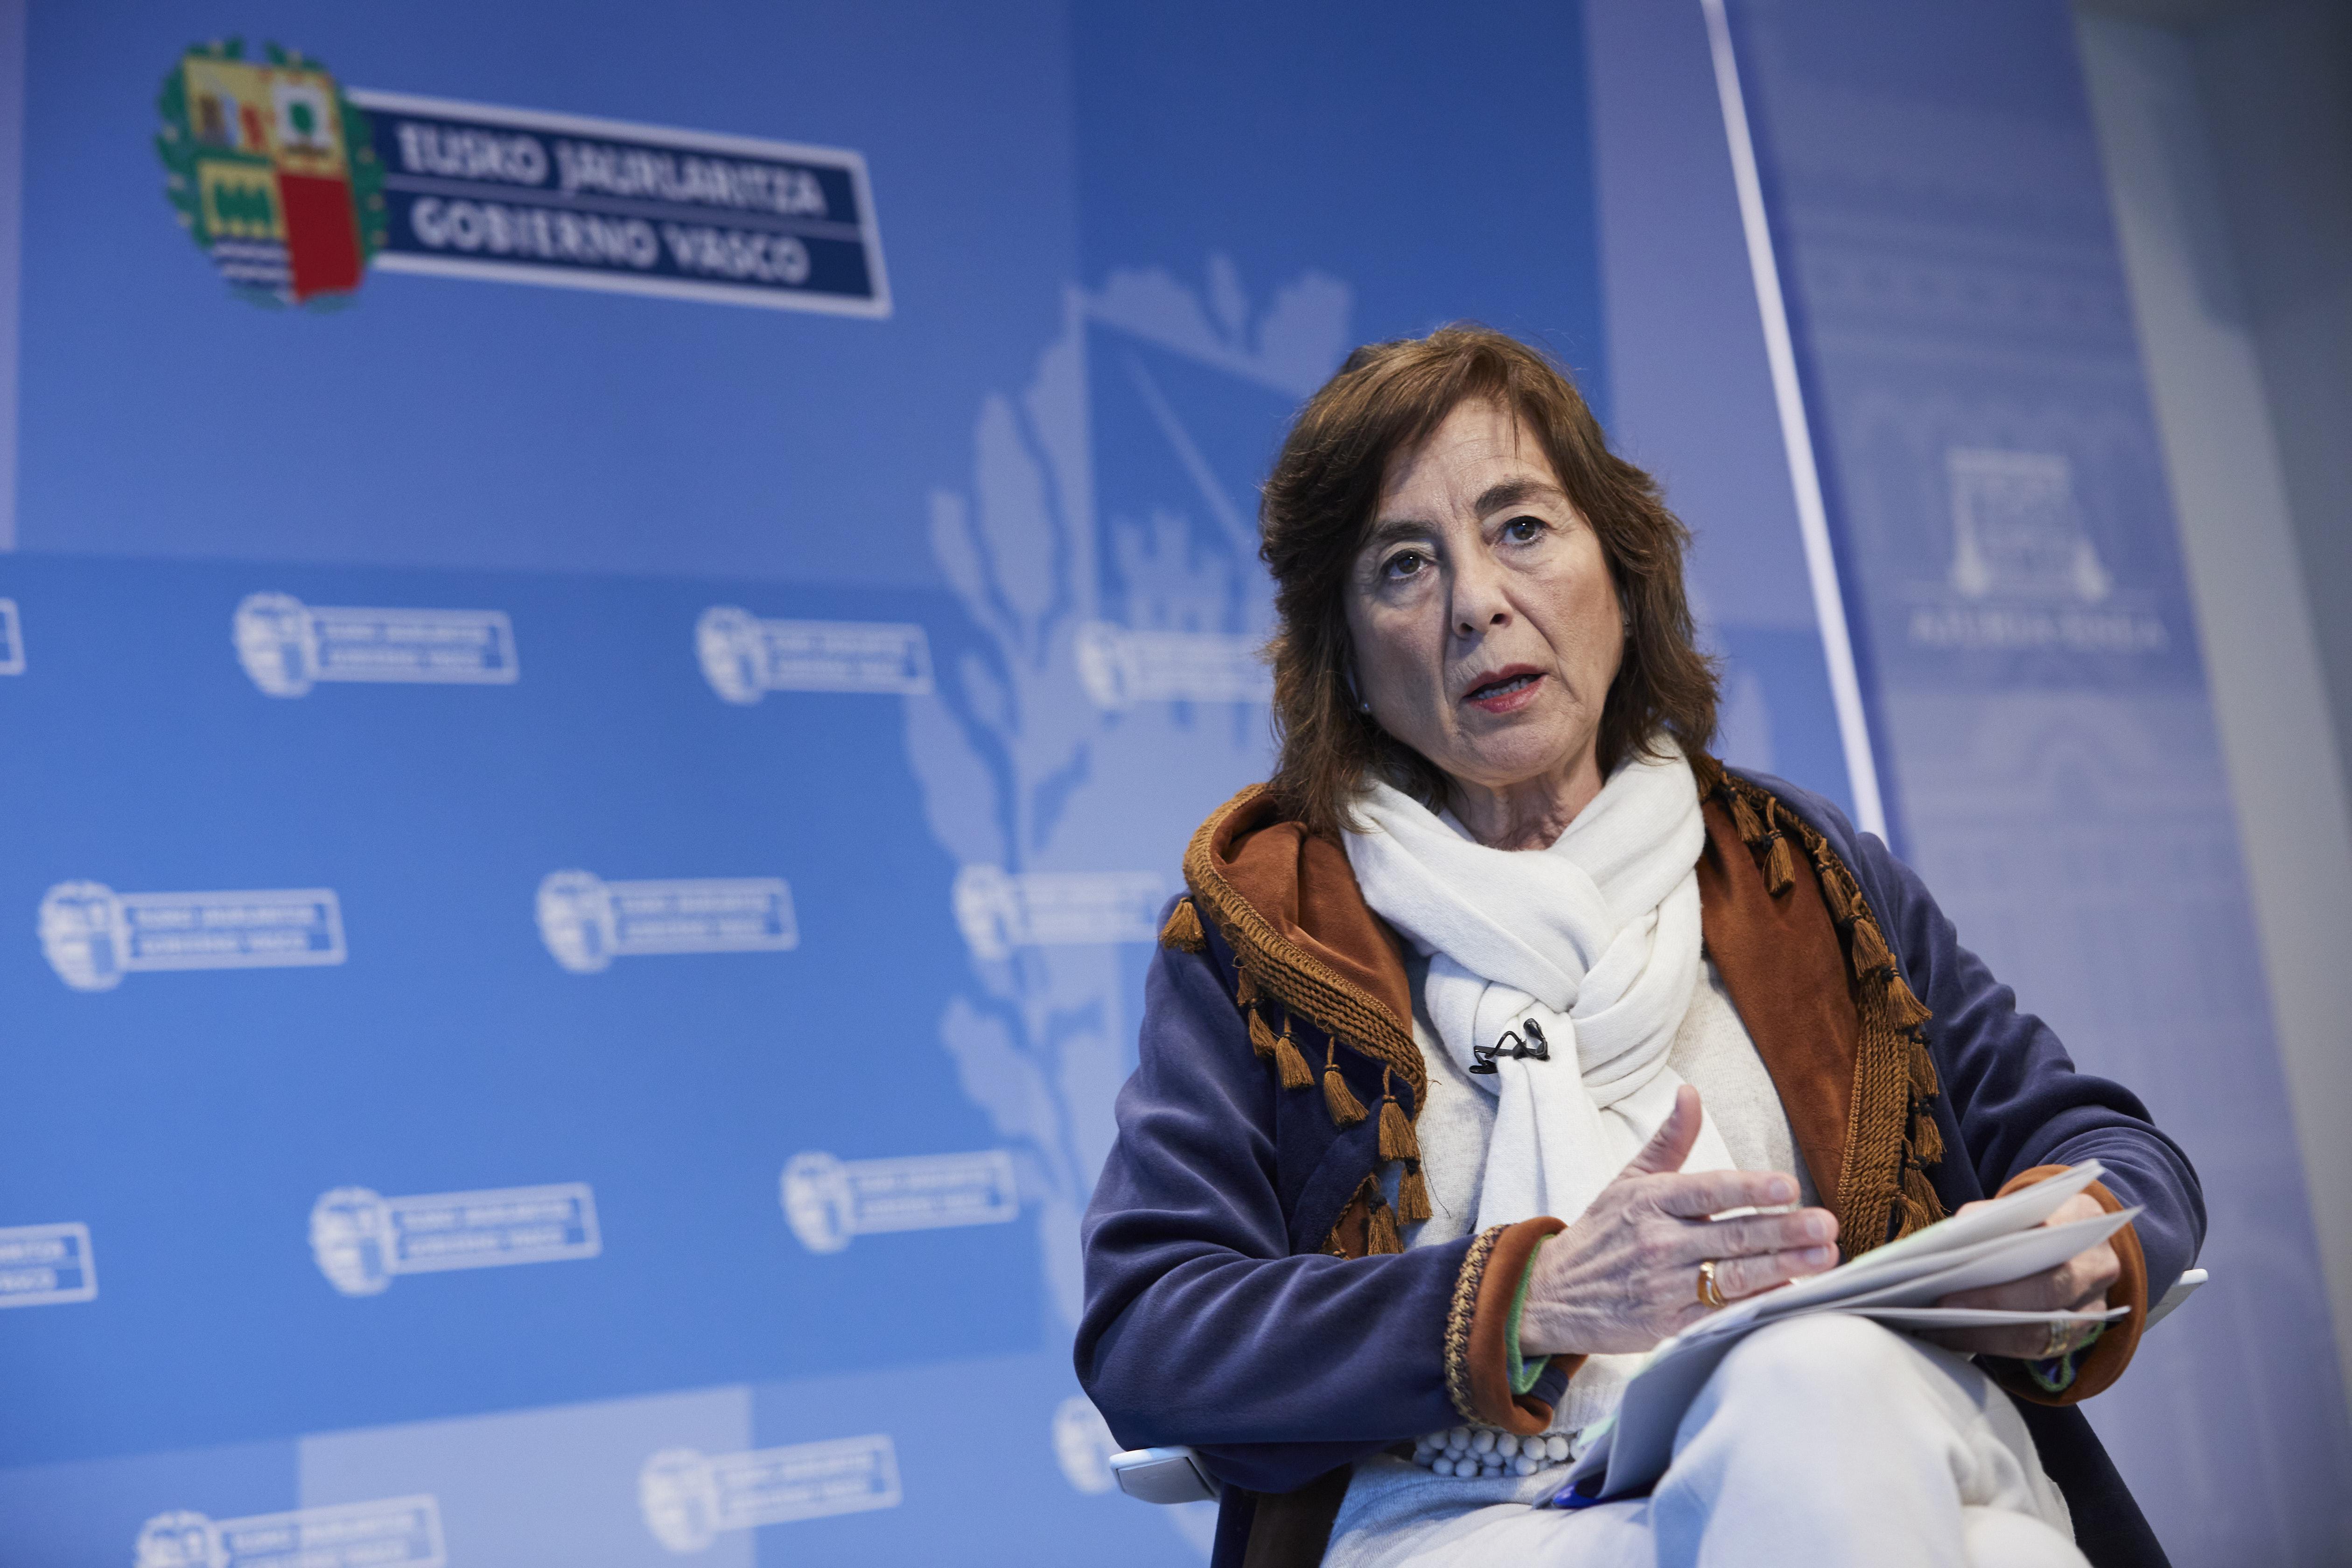 2020.04.08_Uriarte_Egun_On_Euskadi_007.jpg